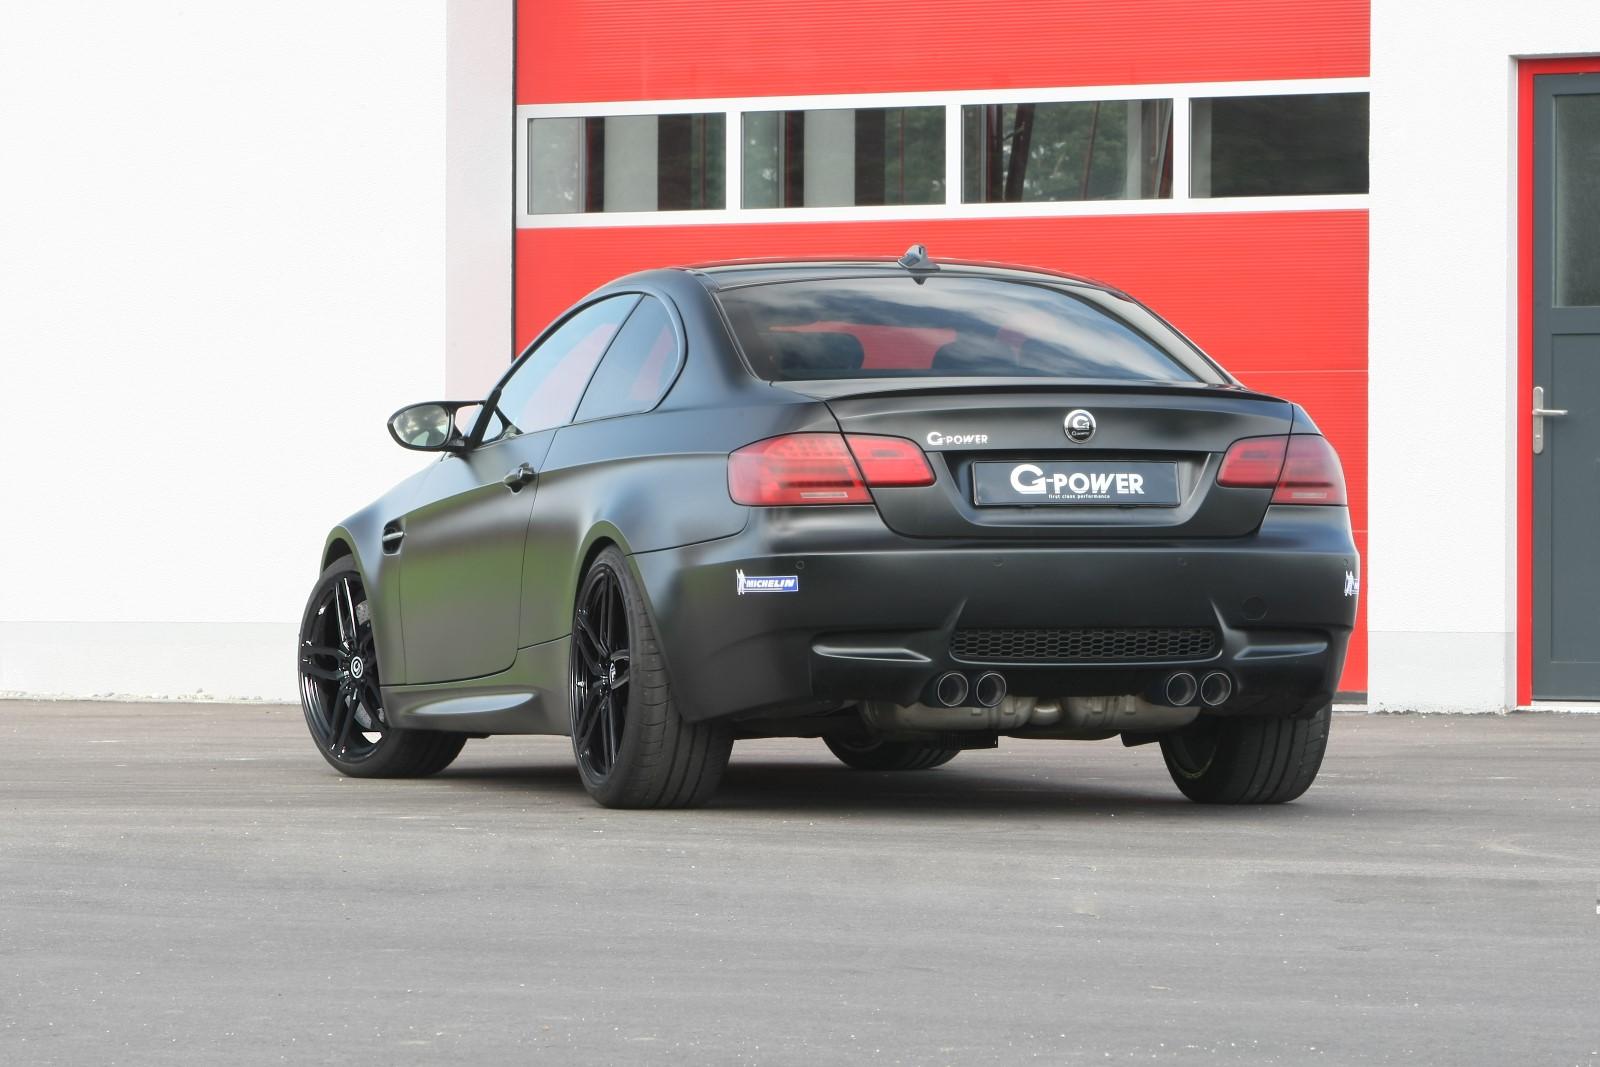 BMW_M3_by_G-Power_0004